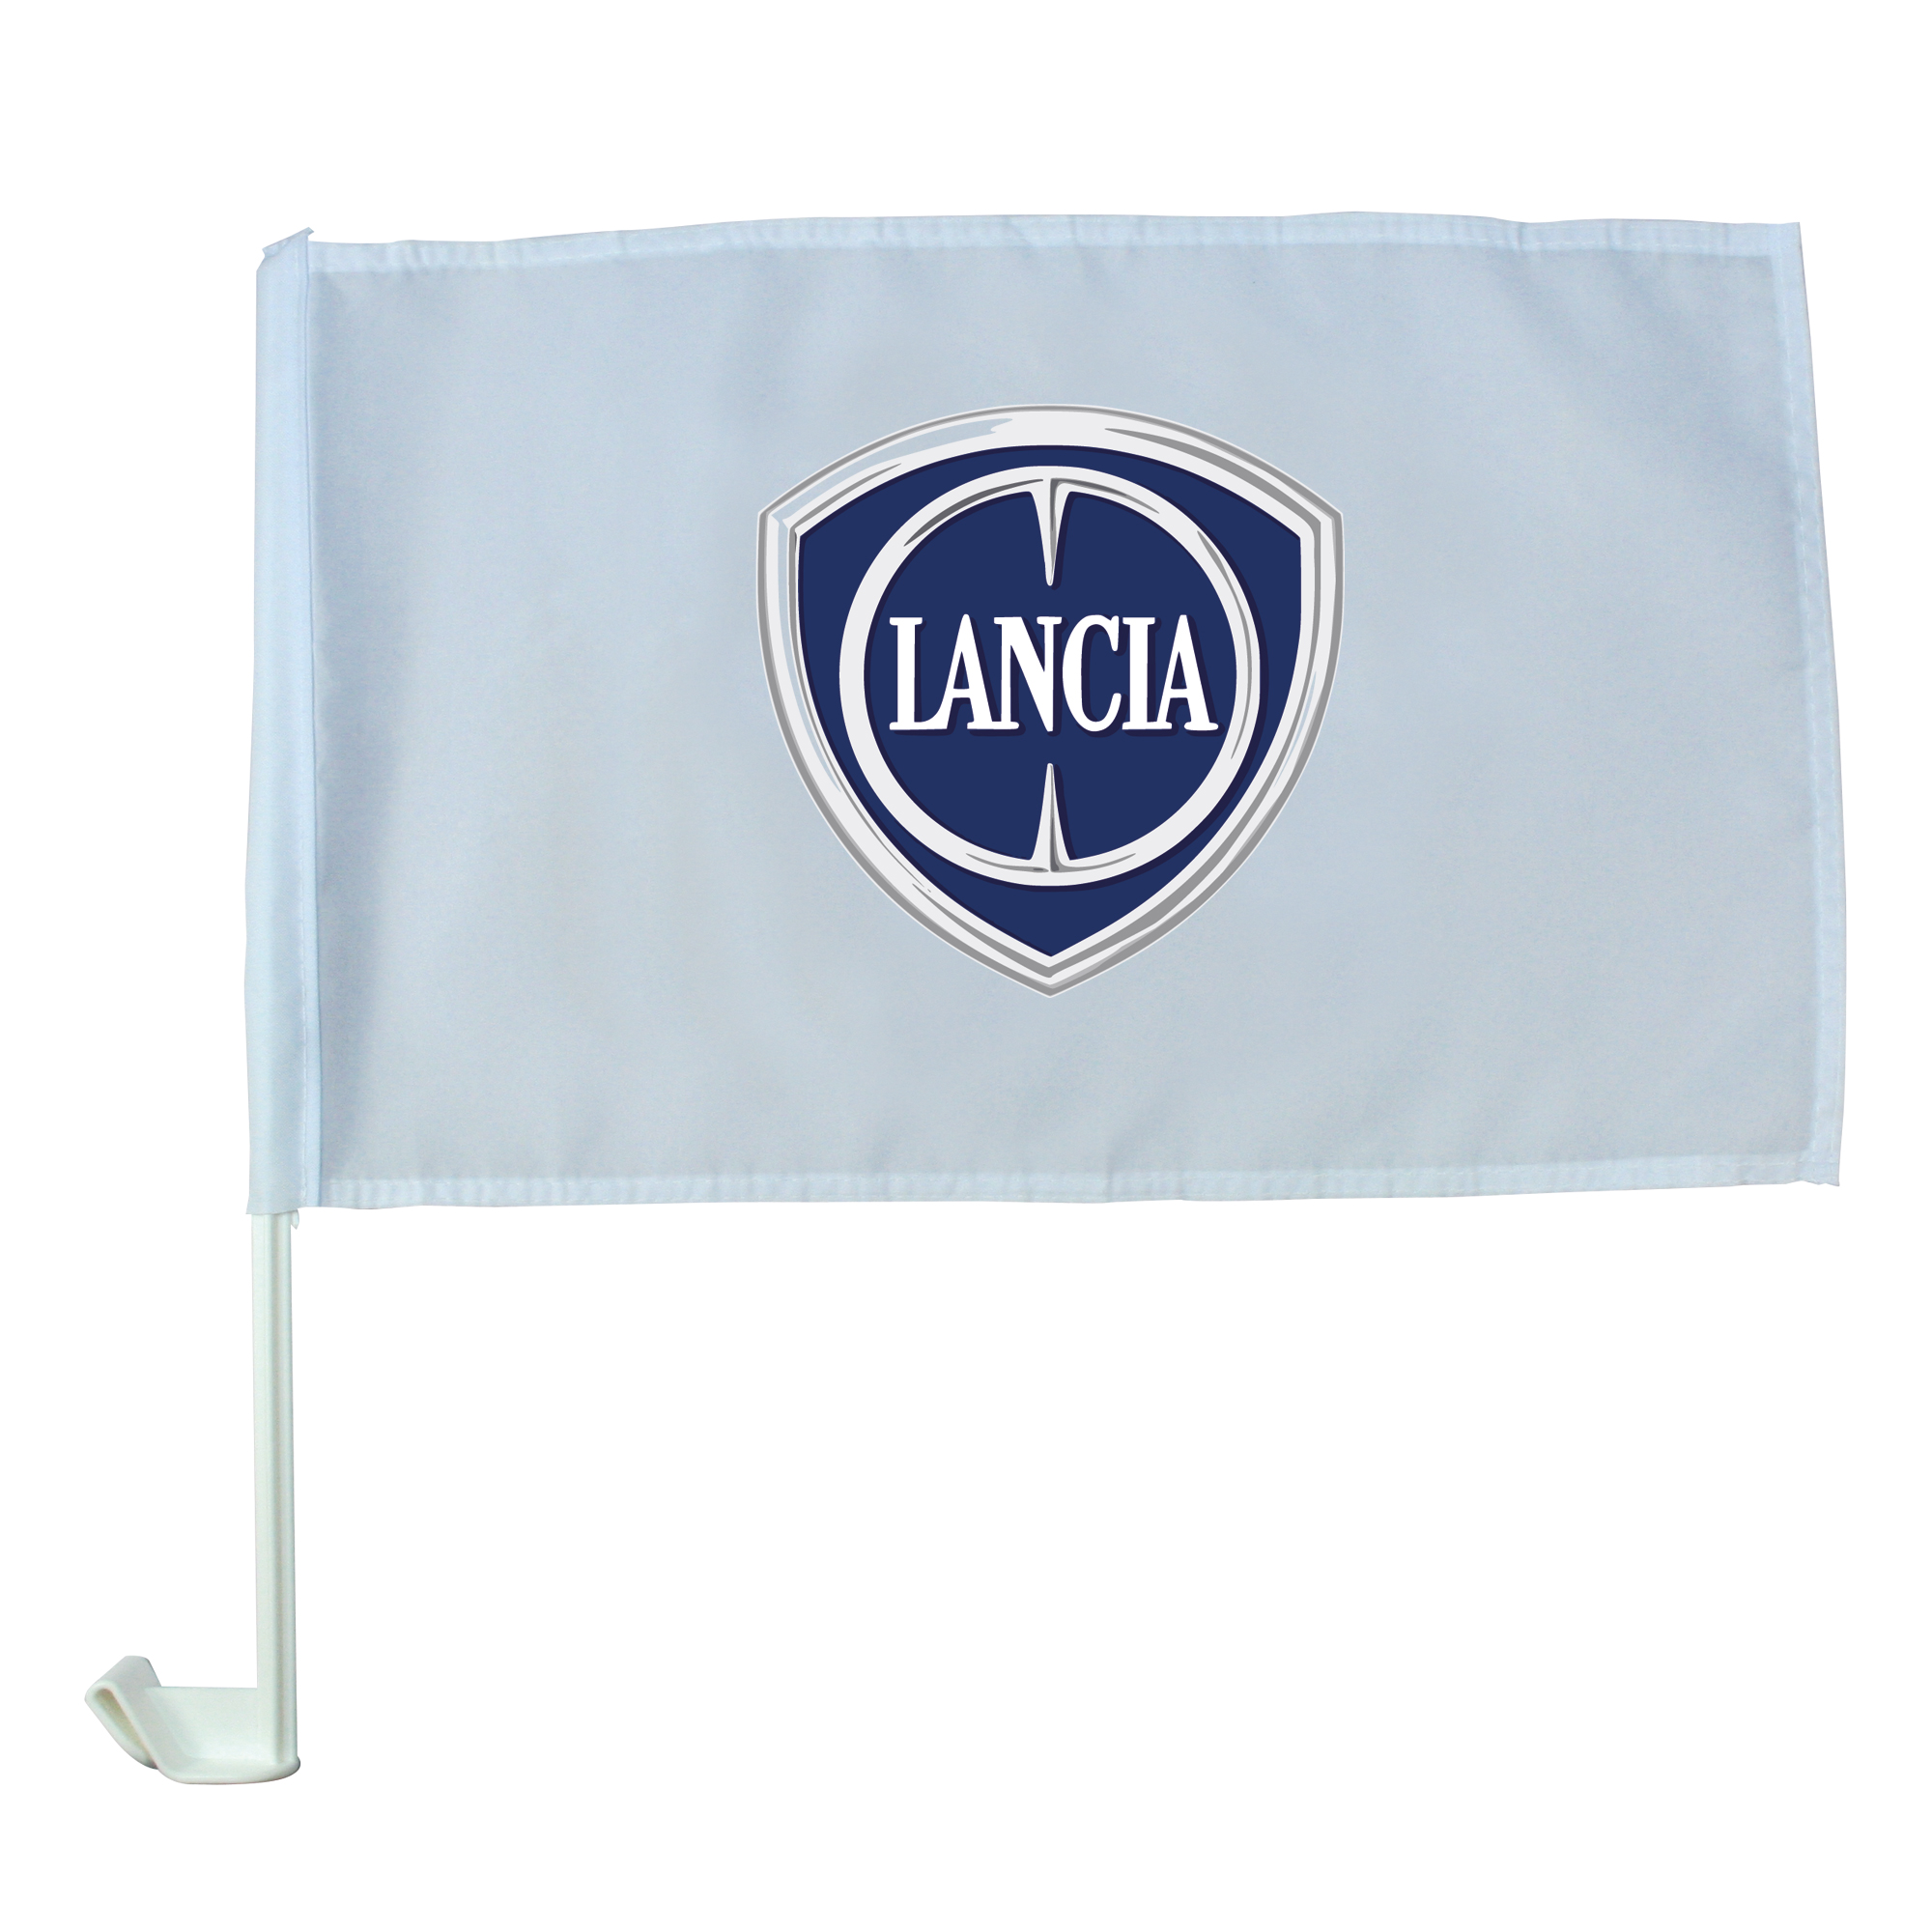 "Fahnen ""Automarken"" Lancia"